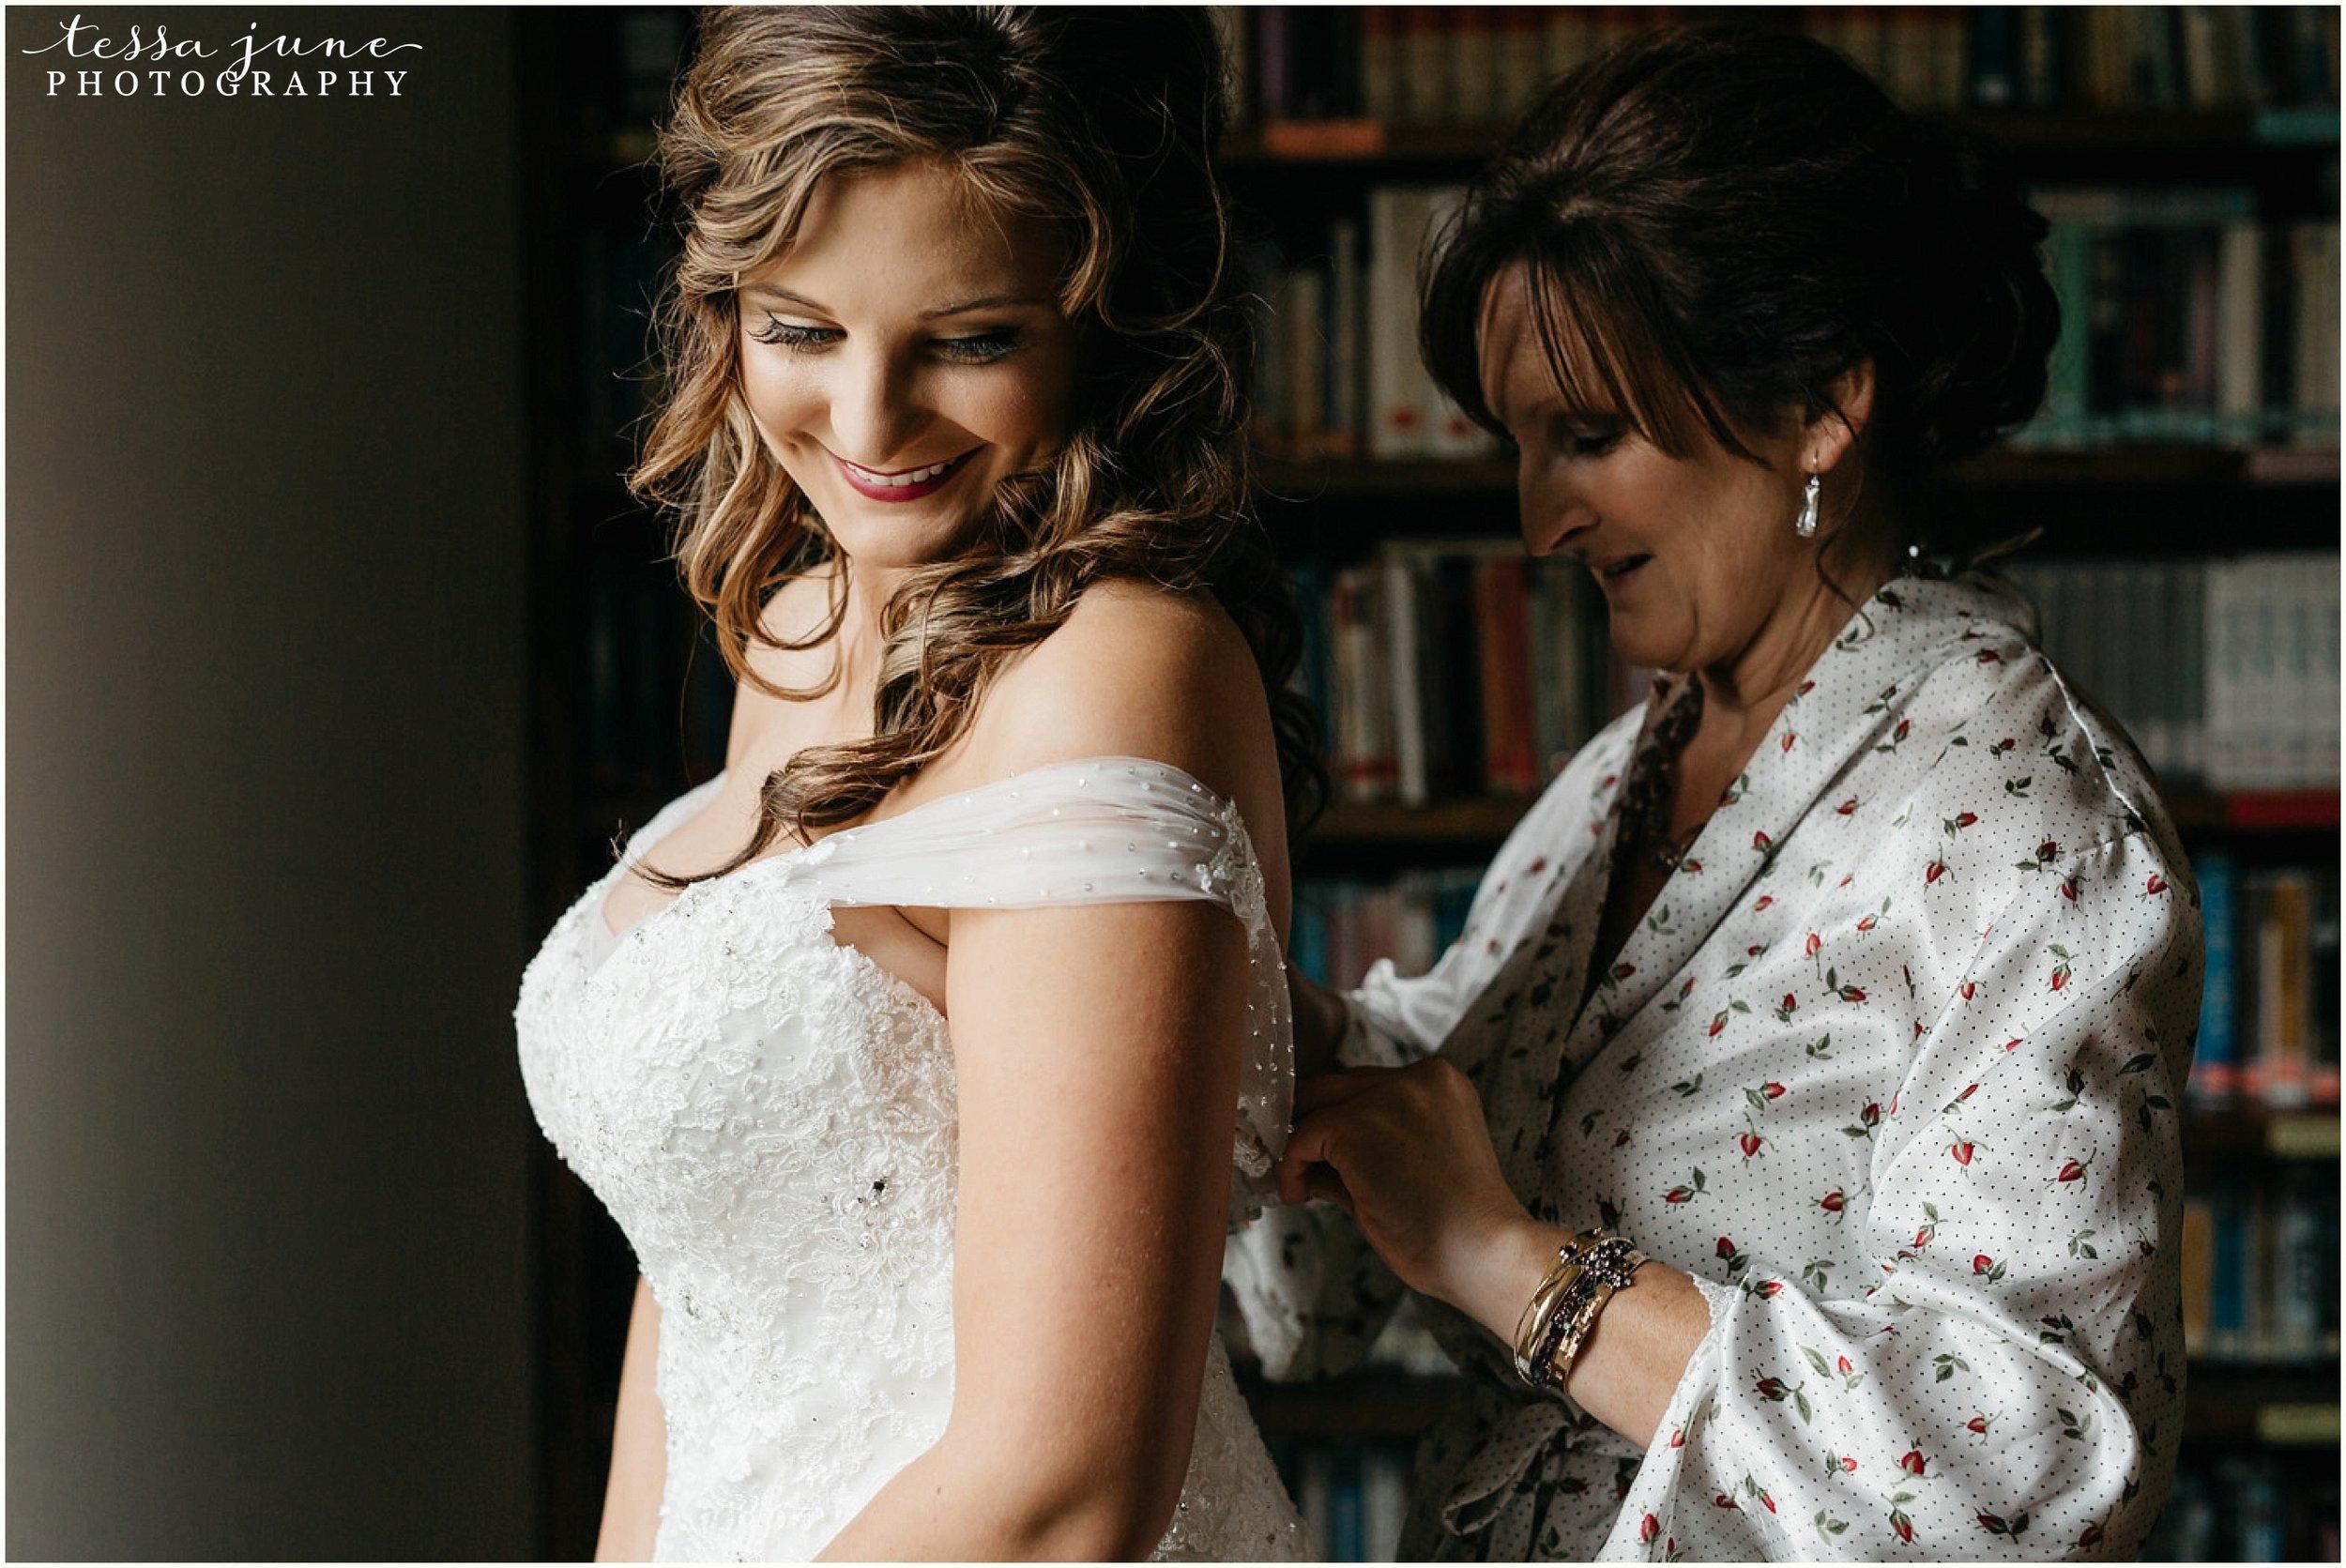 bohemian-minnesota-wedding-mismatched-bridesmaid-dresses-waterfall-st-cloud-tessa-june-photography-26.jpg